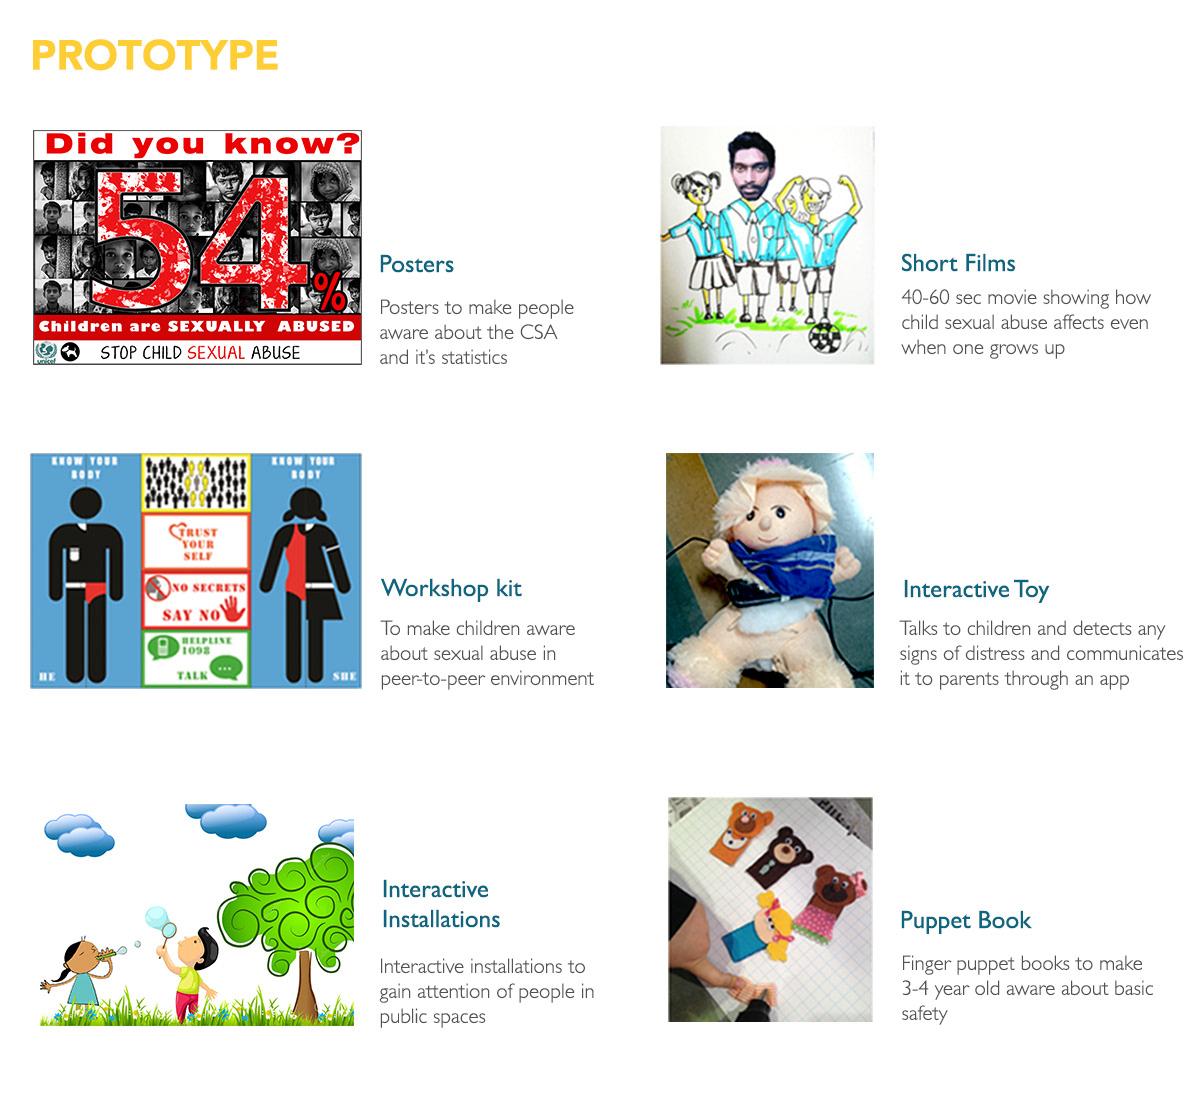 Child Sexual Abuse Workshop design for children